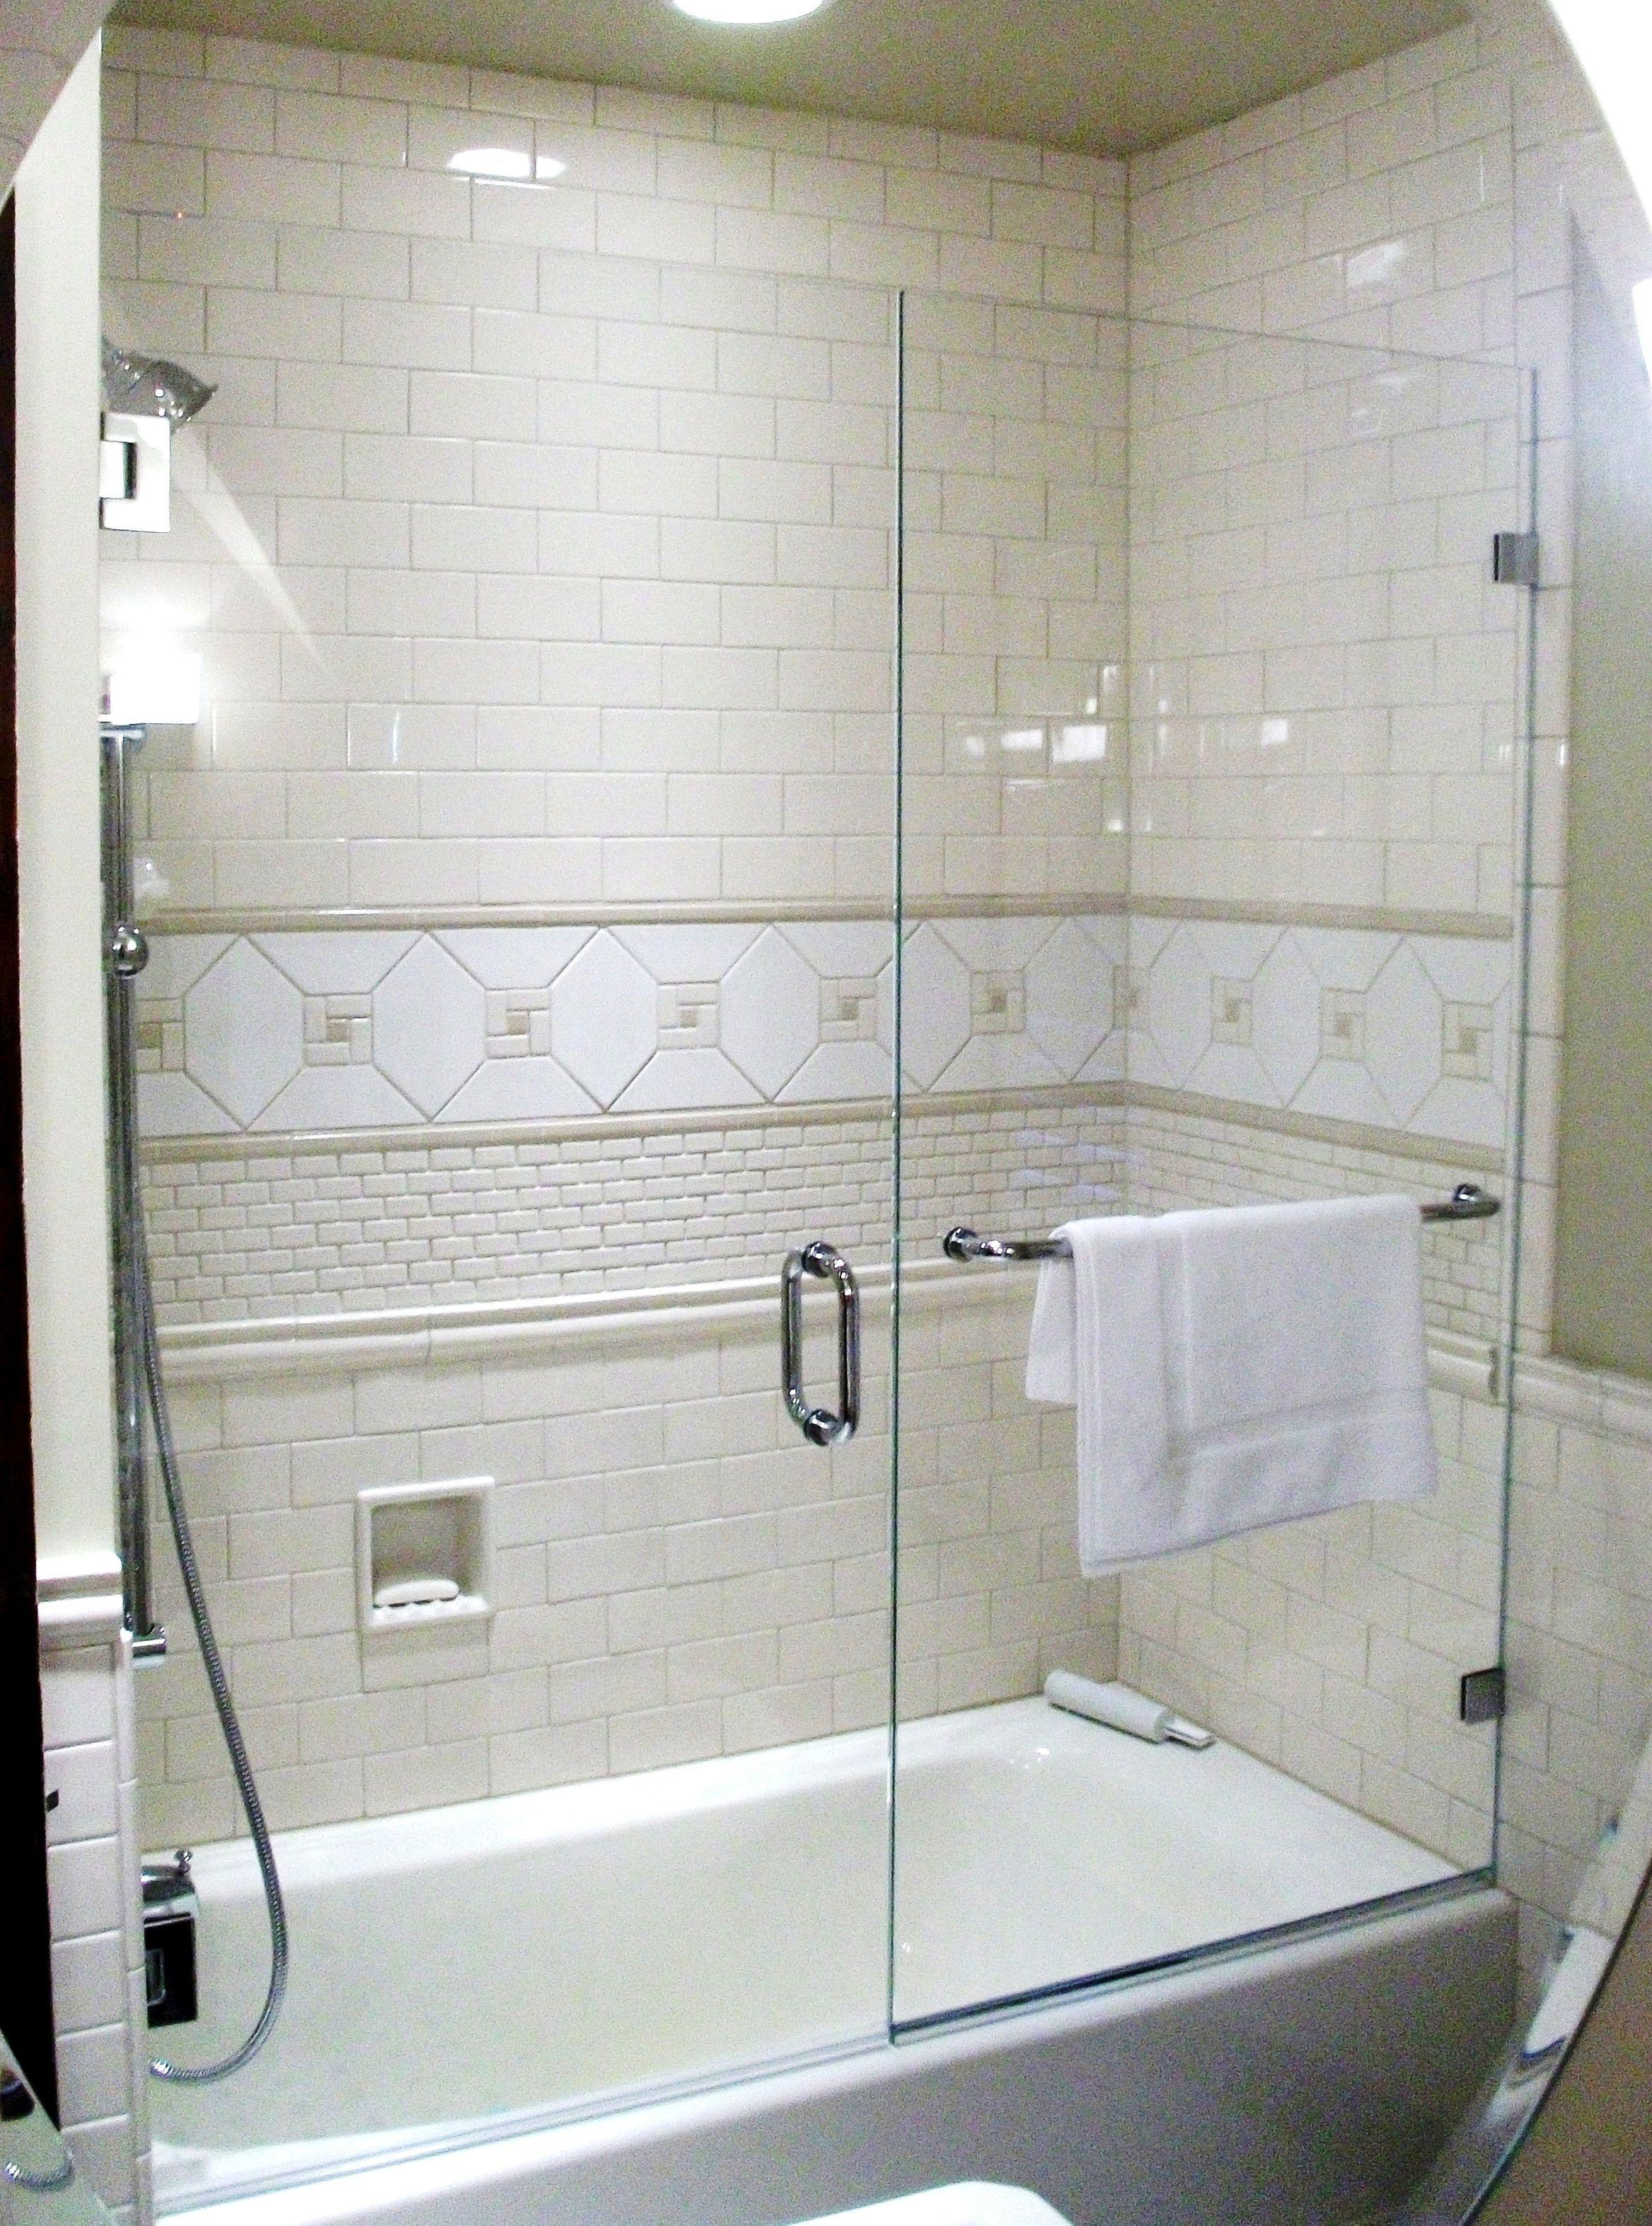 Frameless Shower Enclosure Door Panel On Tub With Wall Mount Clips Single Sided Towel Bar Furnishe Bathtub Shower Doors Bathtub Remodel Tub Shower Doors